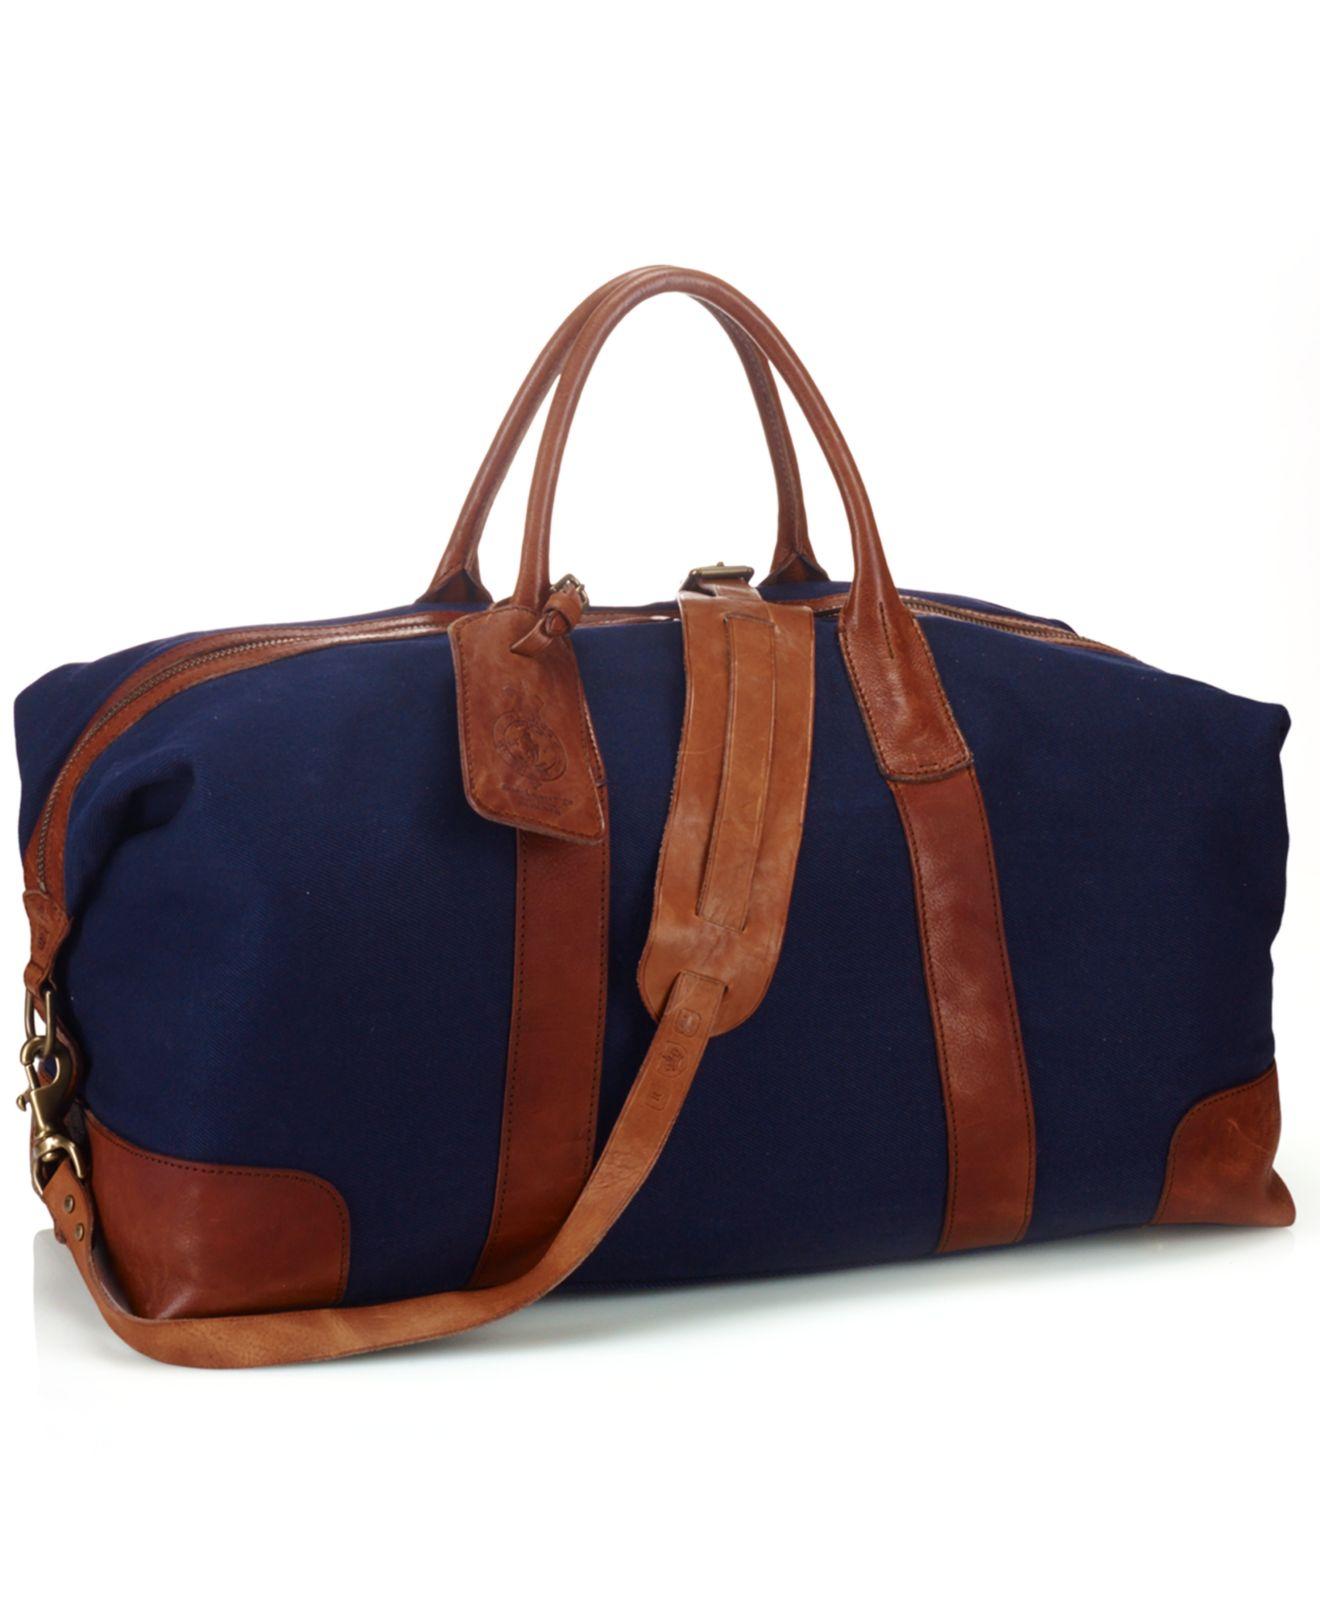 6f1932bb14 ... buy lyst polo ralph lauren canvas duffel bag in blue for men 12d2e 8de41